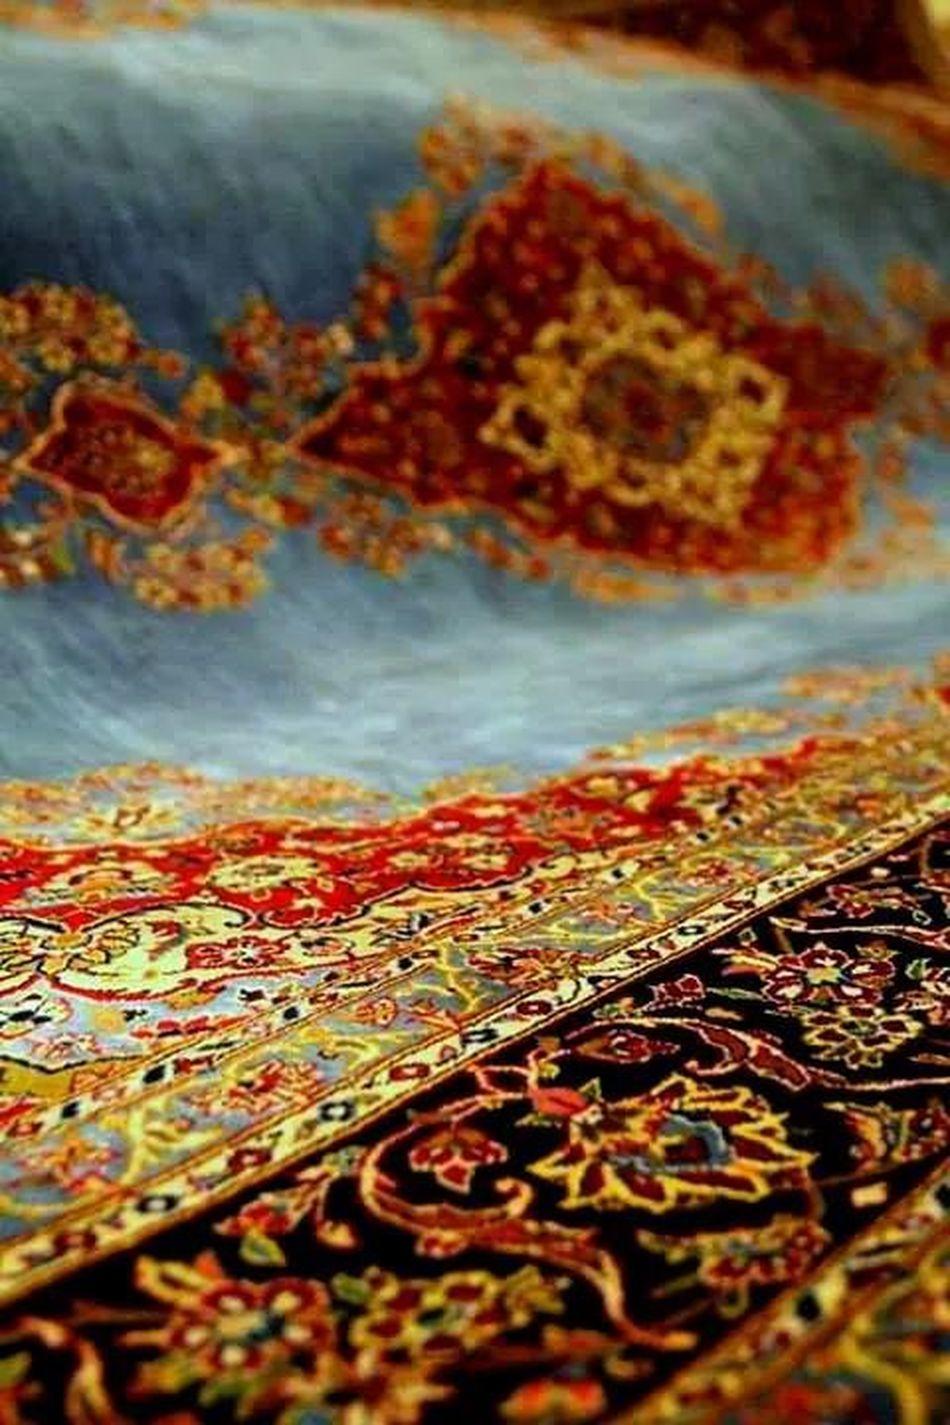 Carpet A Precious Bidjar Carpet In The Tehran Carpet Museum. It's Twin Is In Our Byblos Home. Iran Persian Carpet Bazaar - Kashan - IRAN